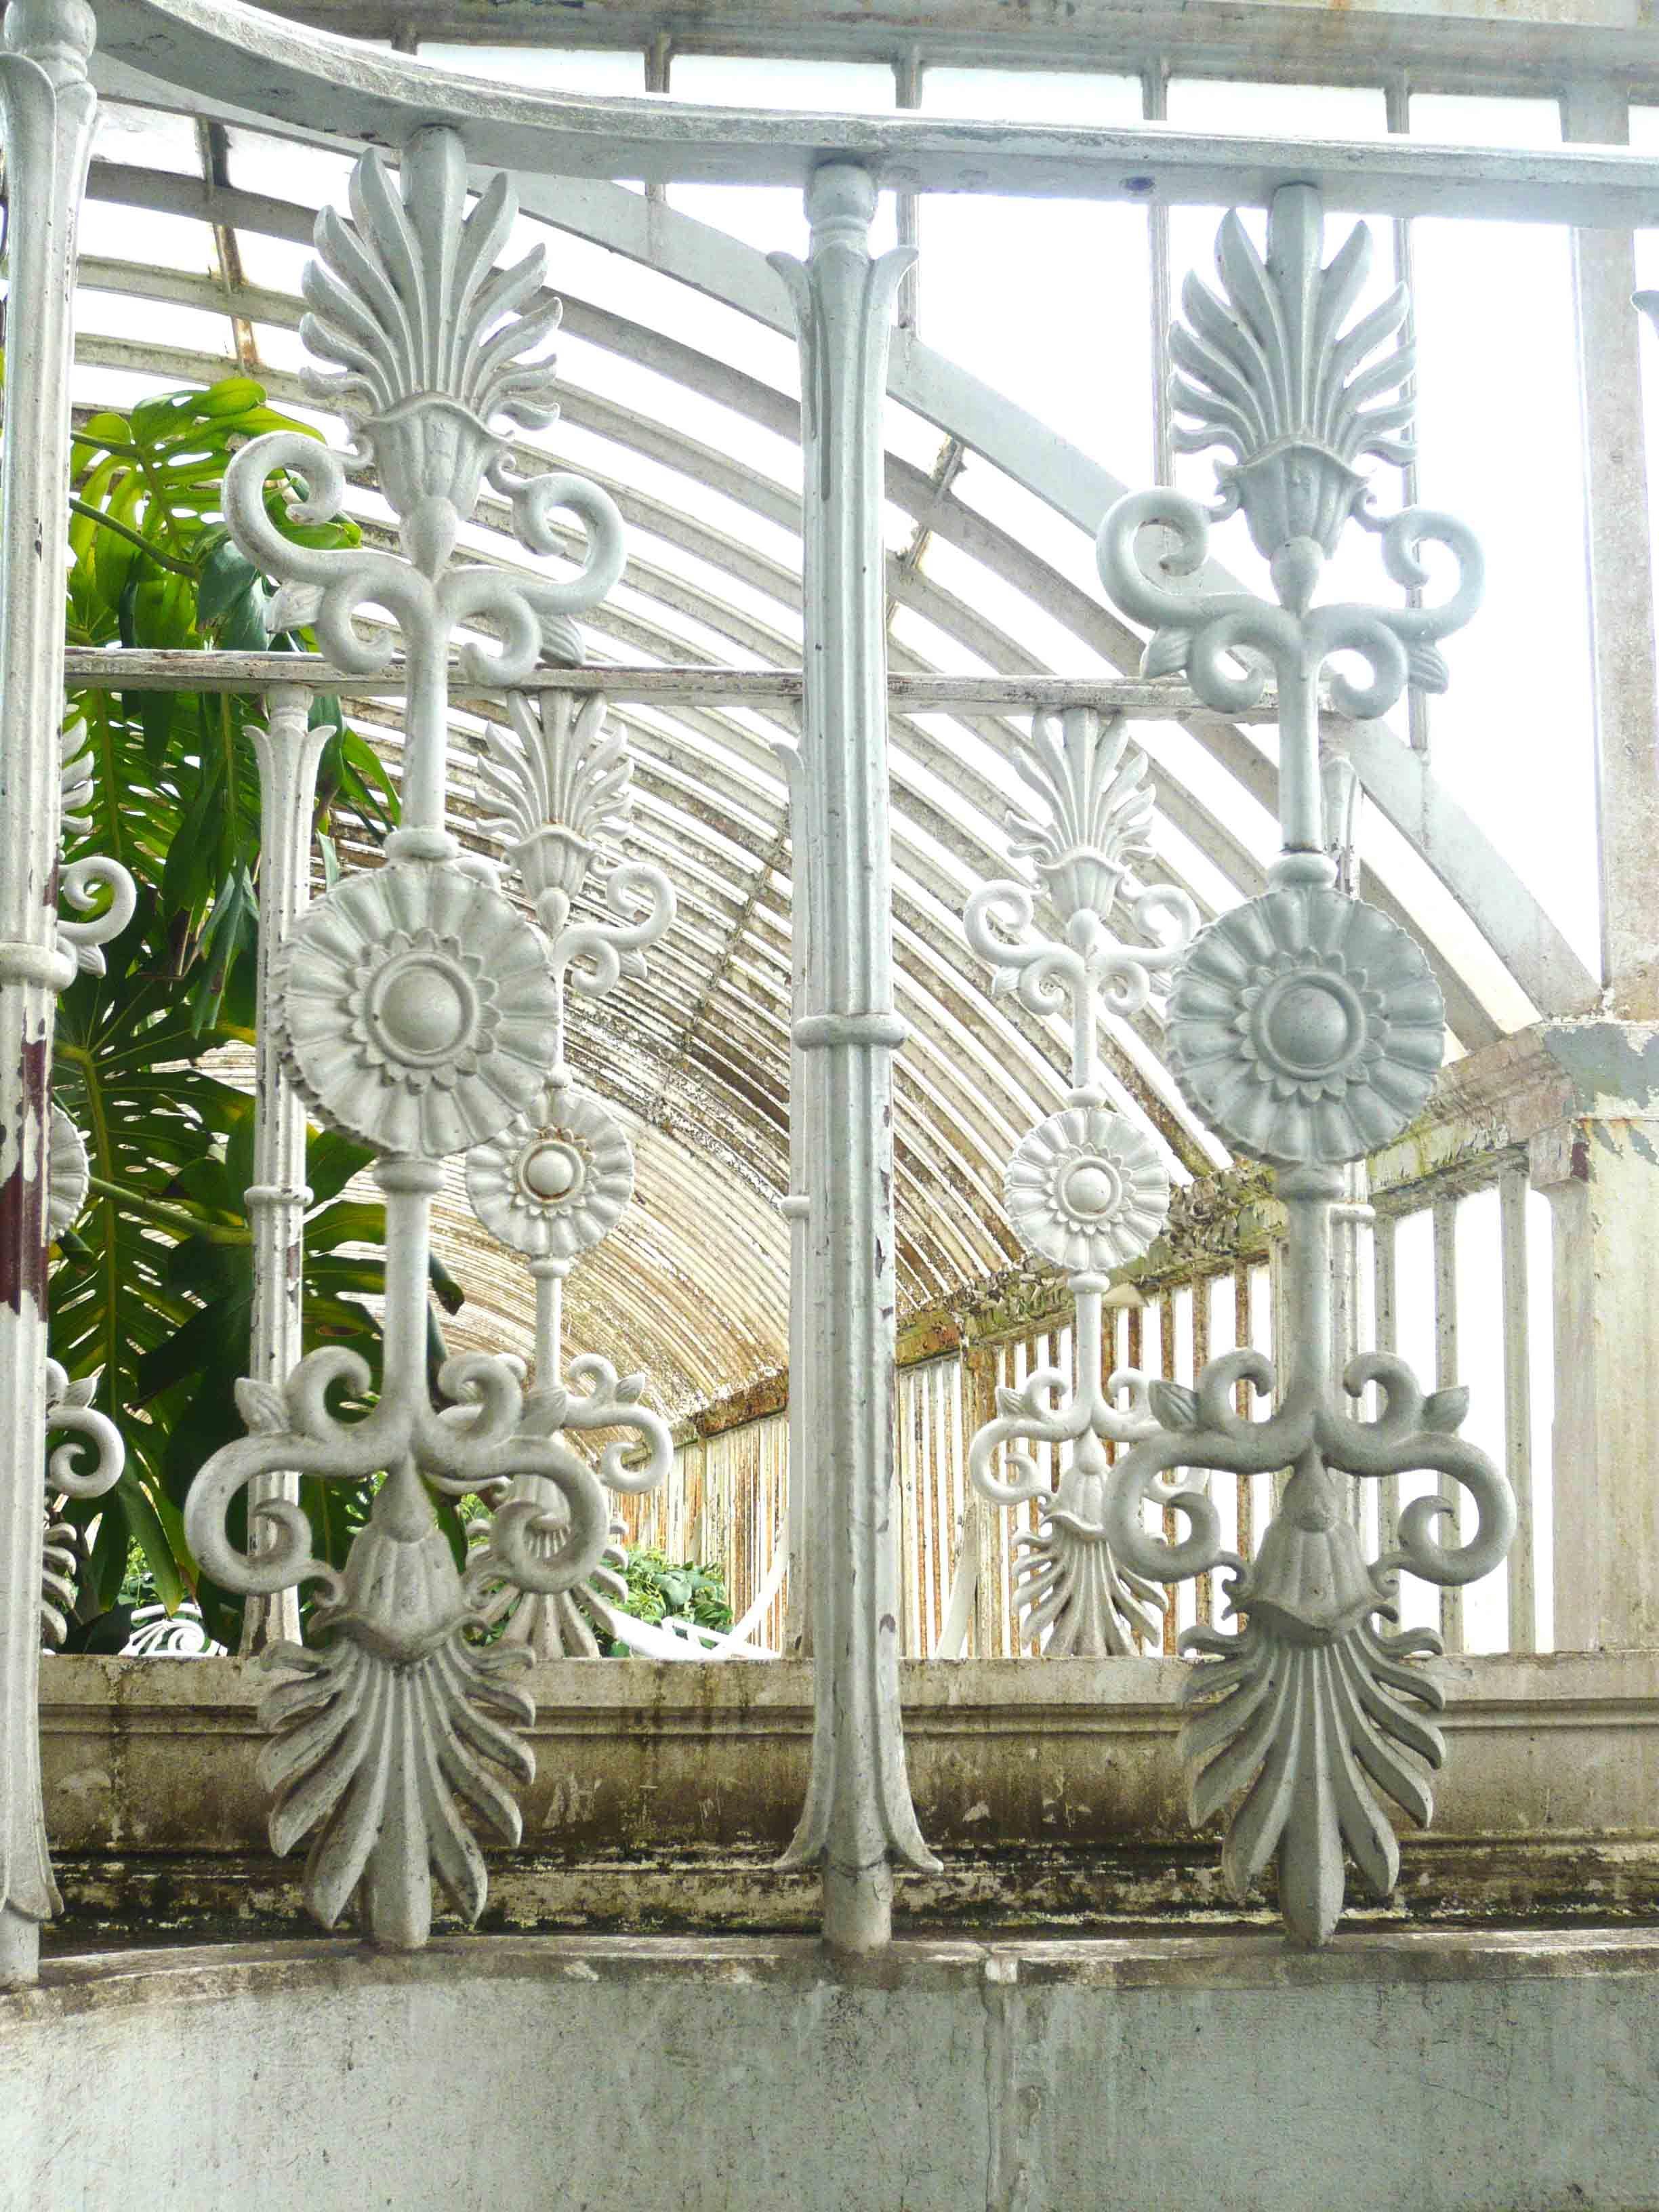 8c4bbacede7dafd5cd050117e7988d69 - Palm House Kew Gardens London England